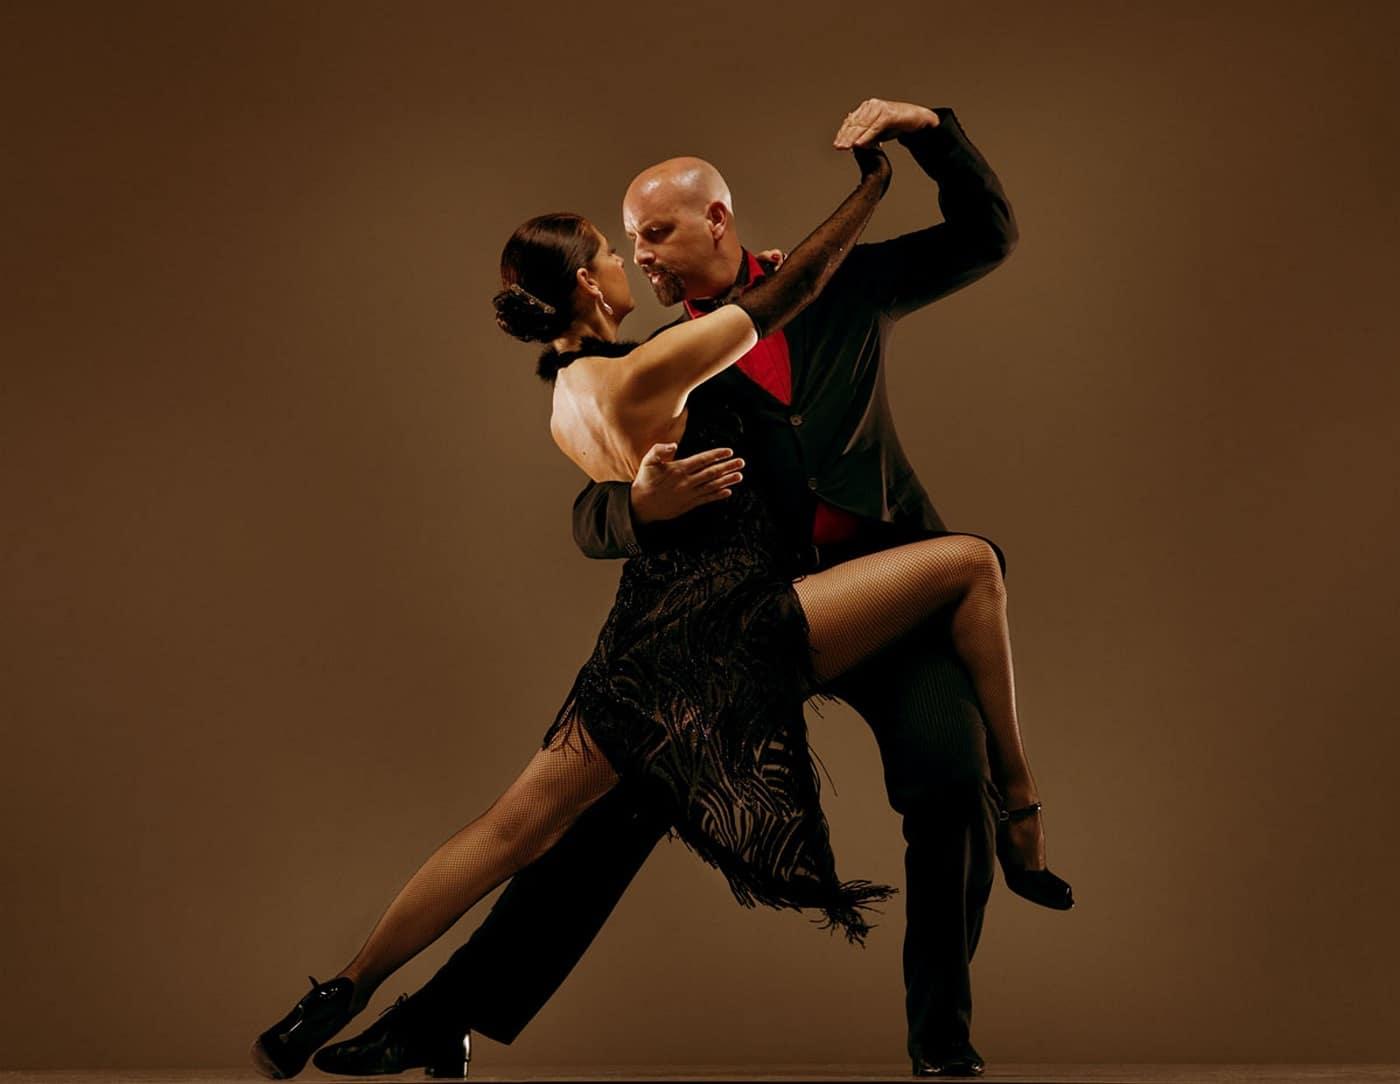 Tango, dansul tradițional argentinian